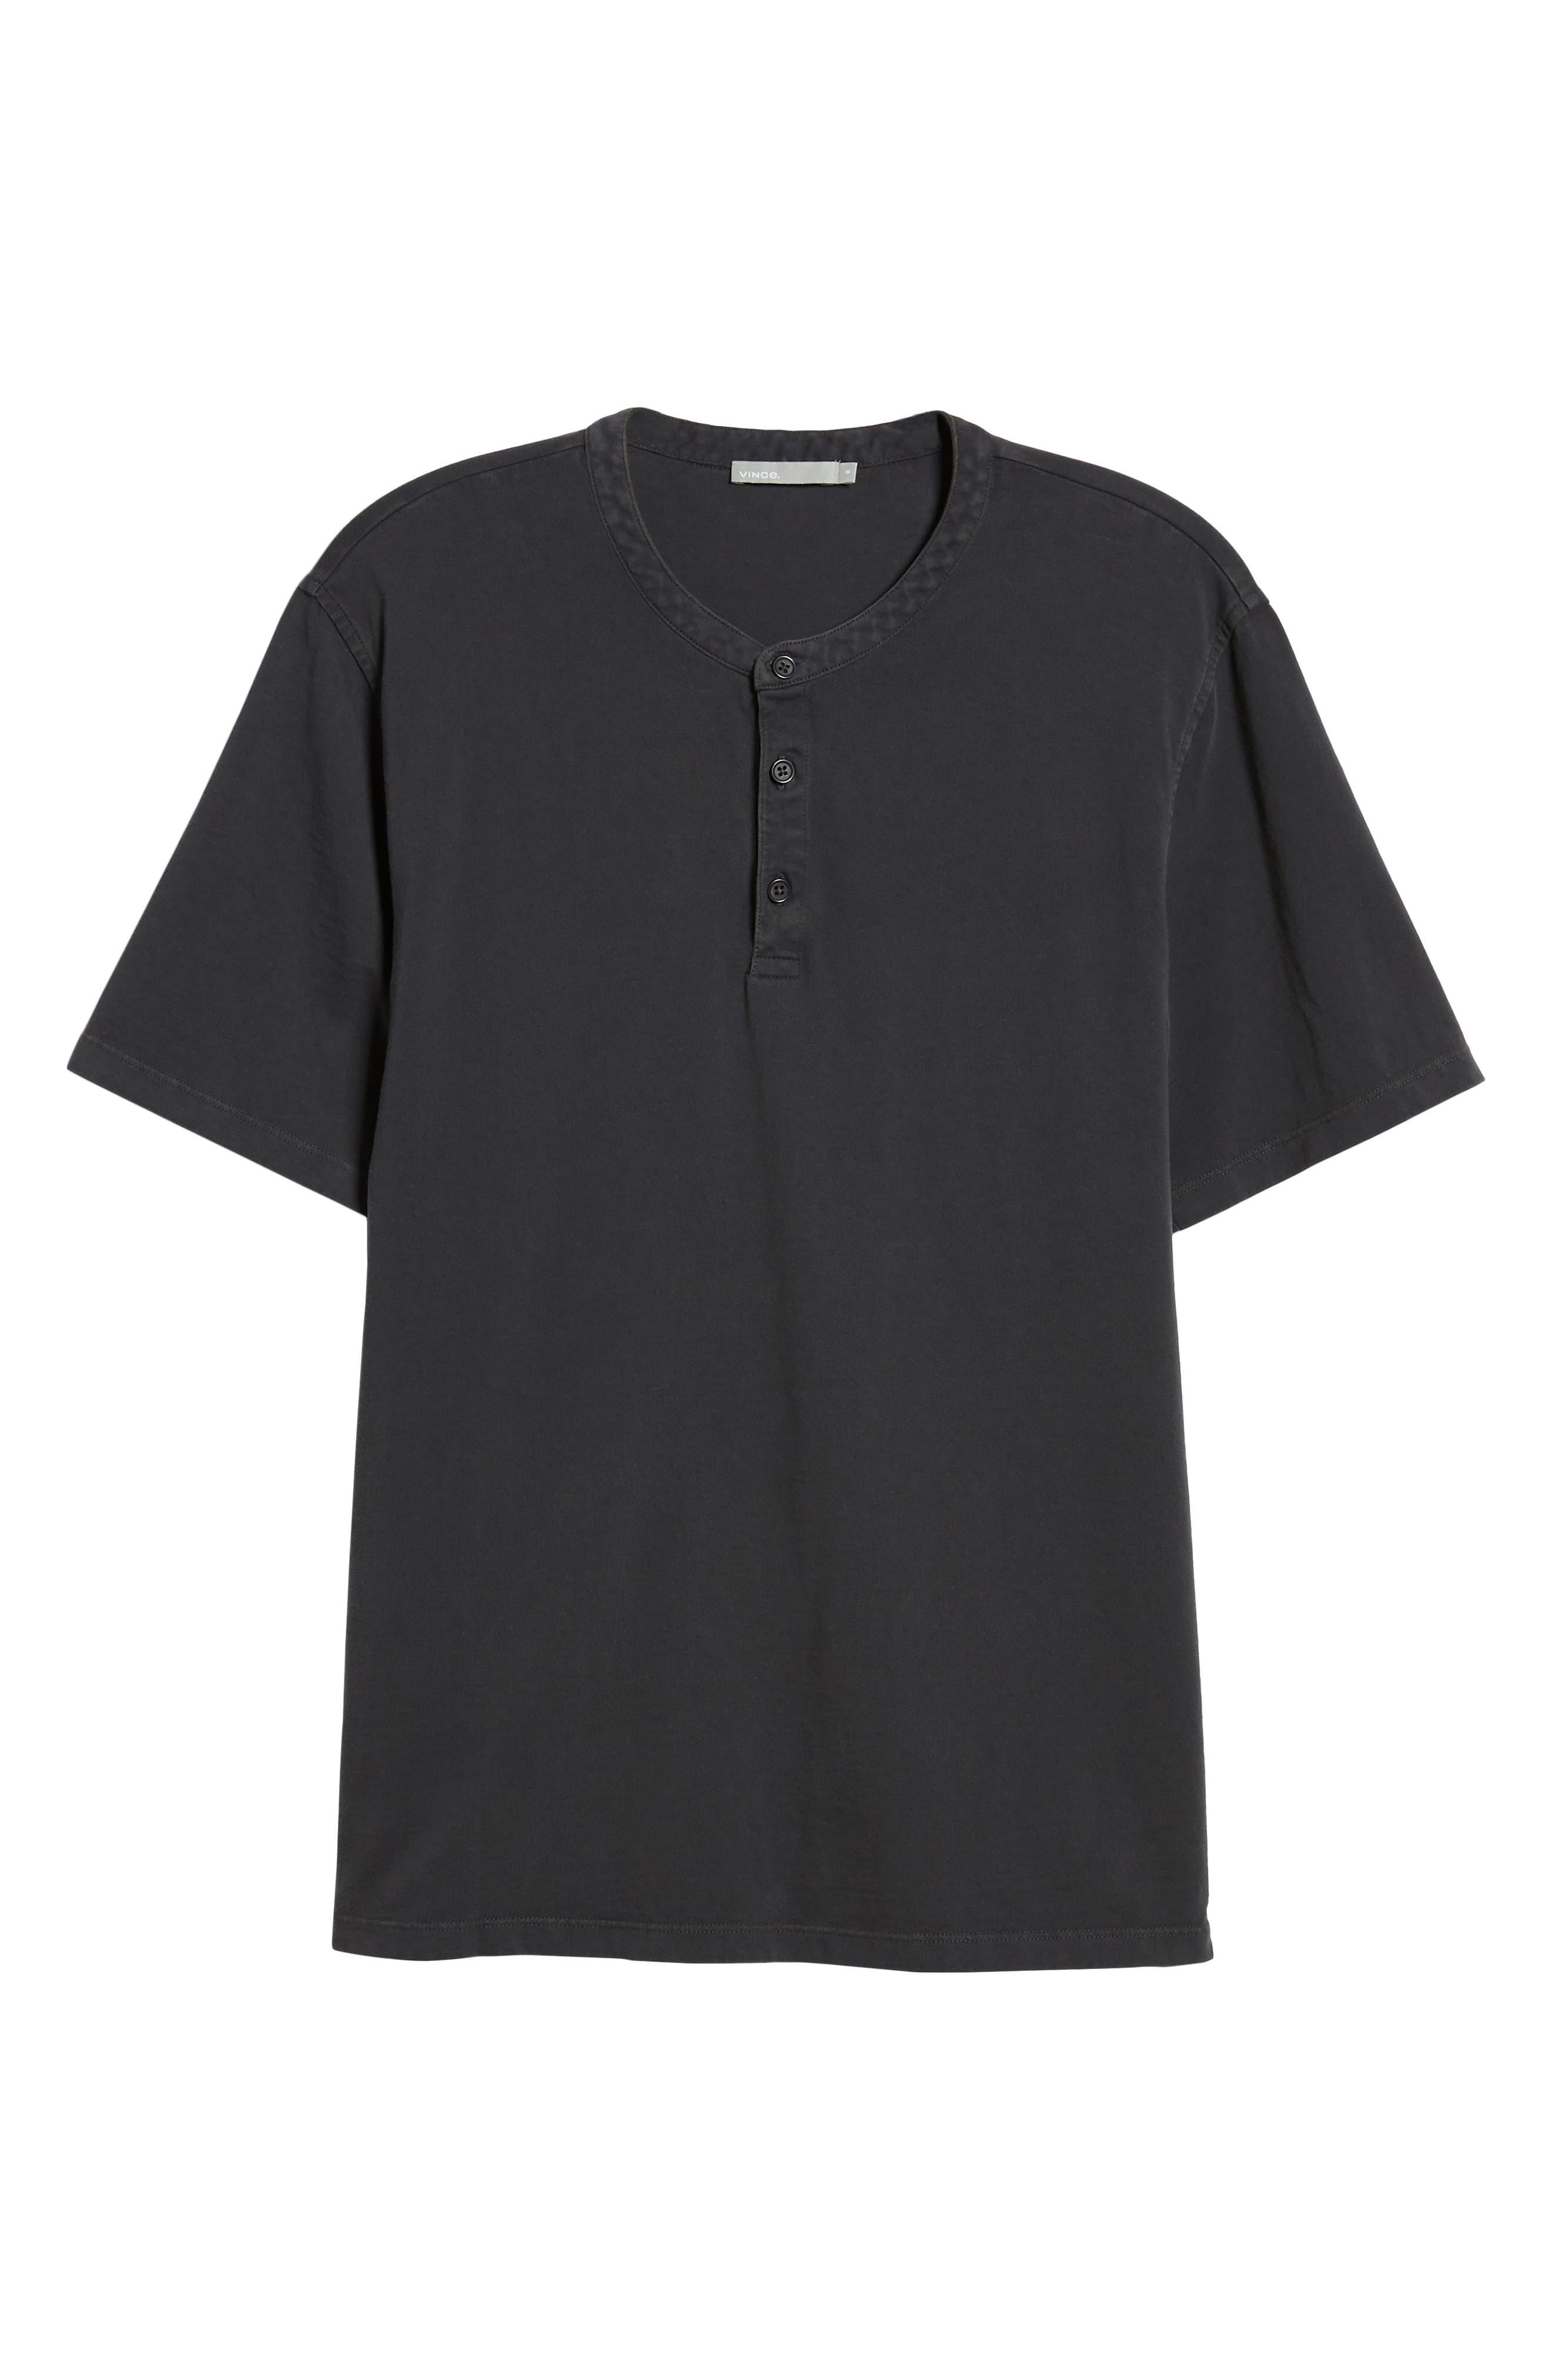 Regular Fit Garment Dye Short Sleeve Henley,                             Alternate thumbnail 6, color,                             WASHED BLACK